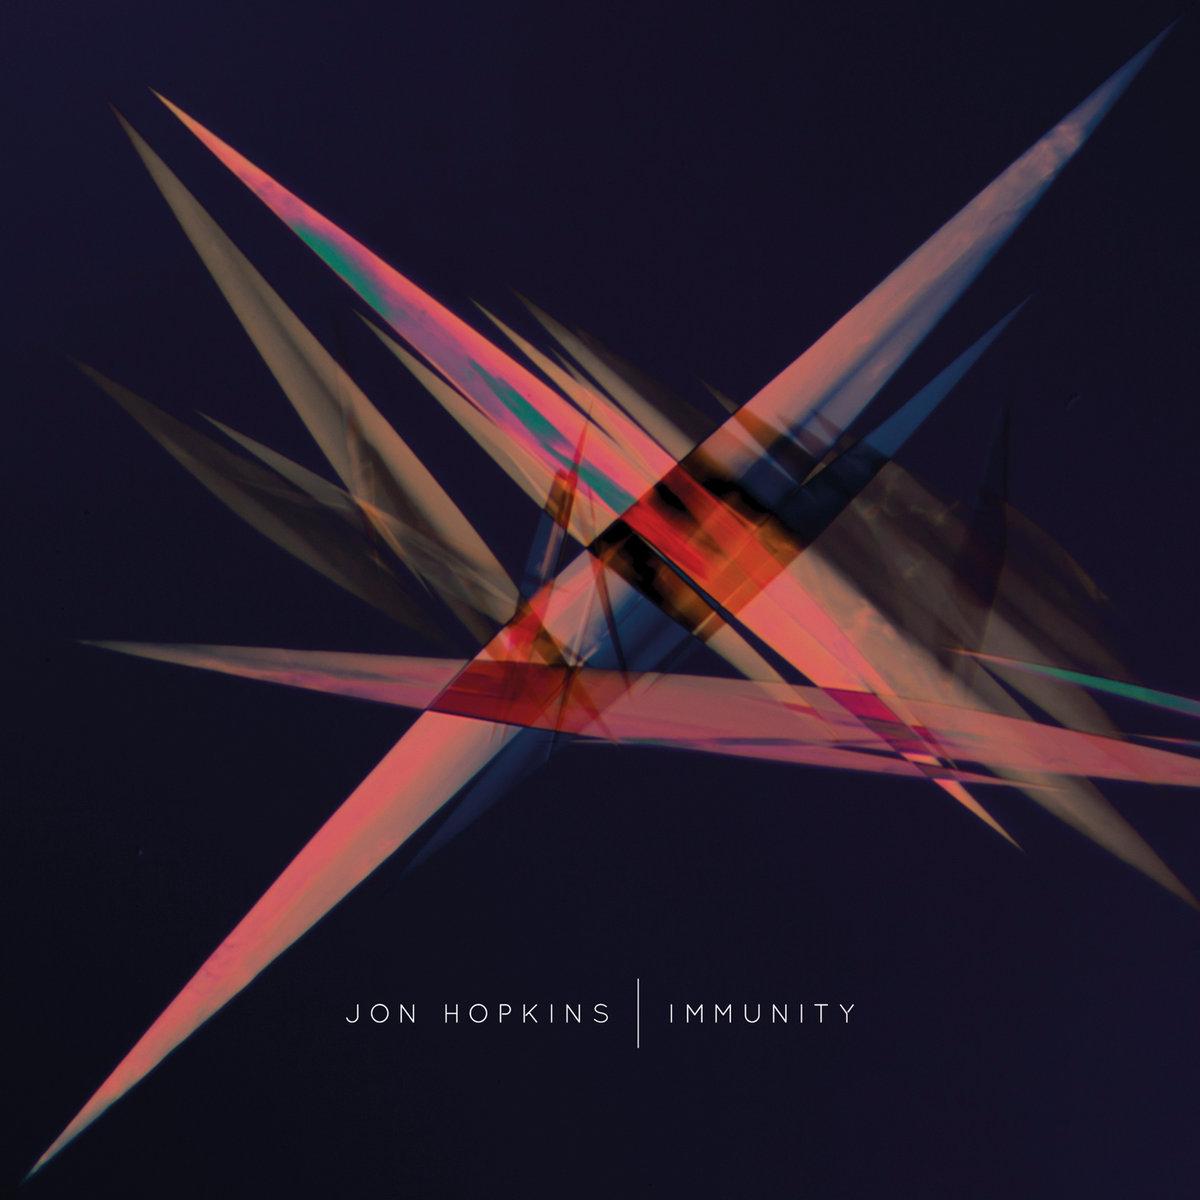 Jon Hopkins - Immunity [LP]